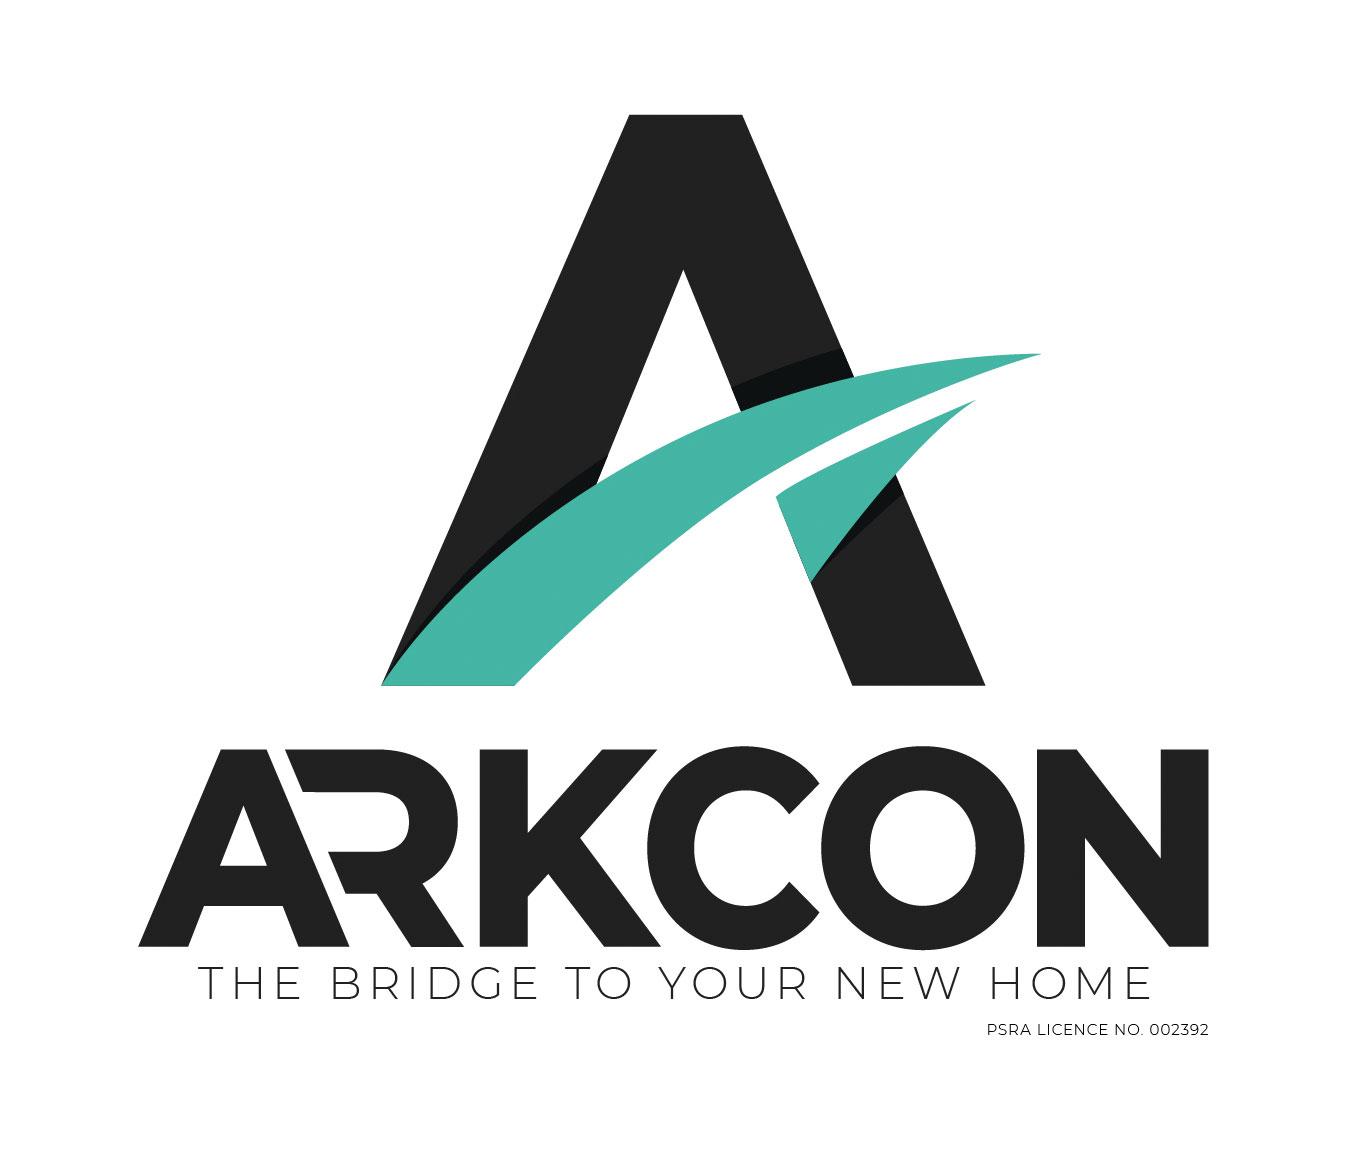 Arkcon Properties - Property Agency Rebrand